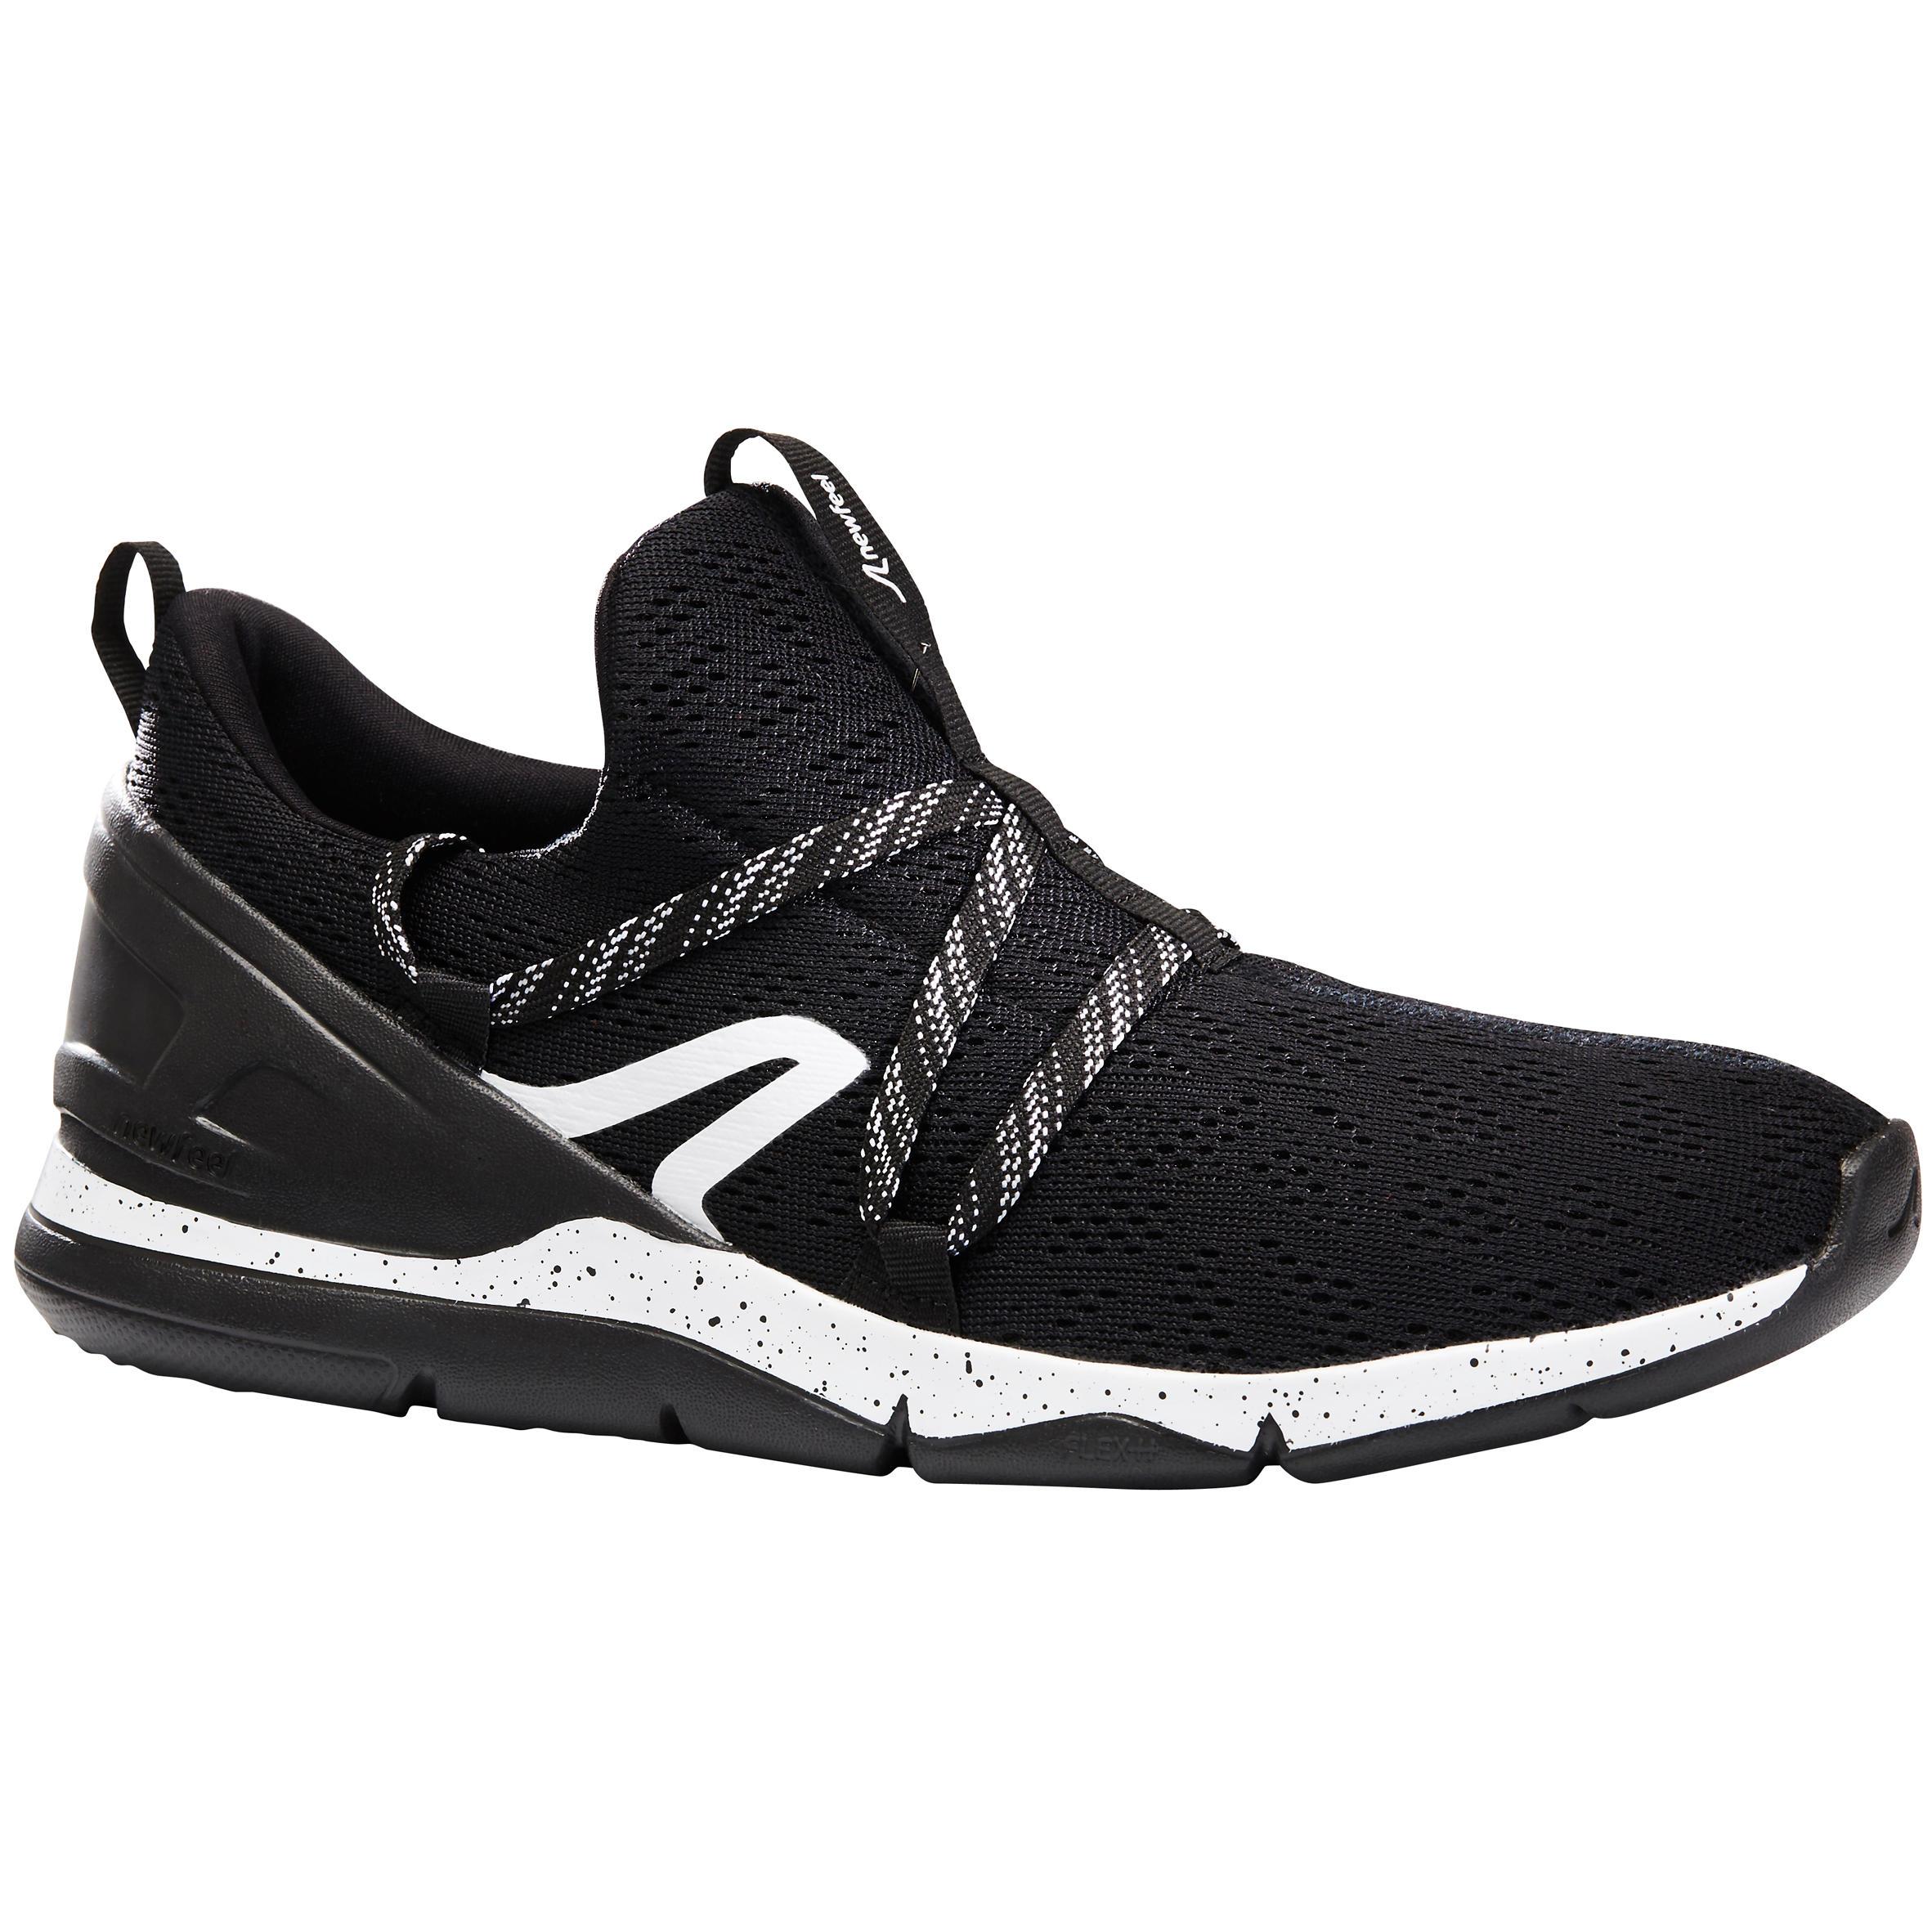 PW 140 Men's Fitness Walking Shoes